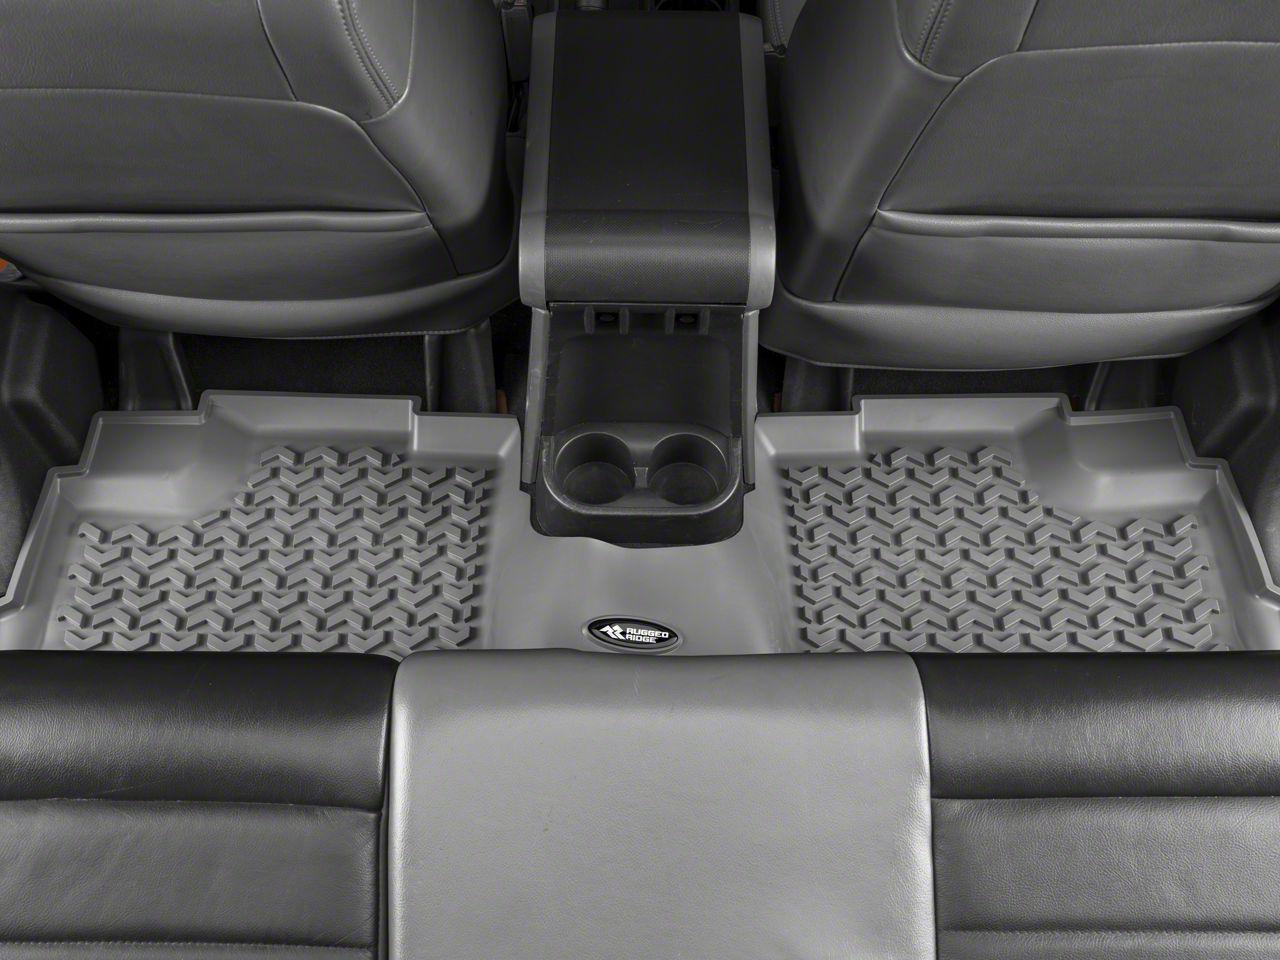 Rugged Ridge All-Terrain Rear Floor Mat - Gray (07-18 Jeep Wrangler JK 4 Door)